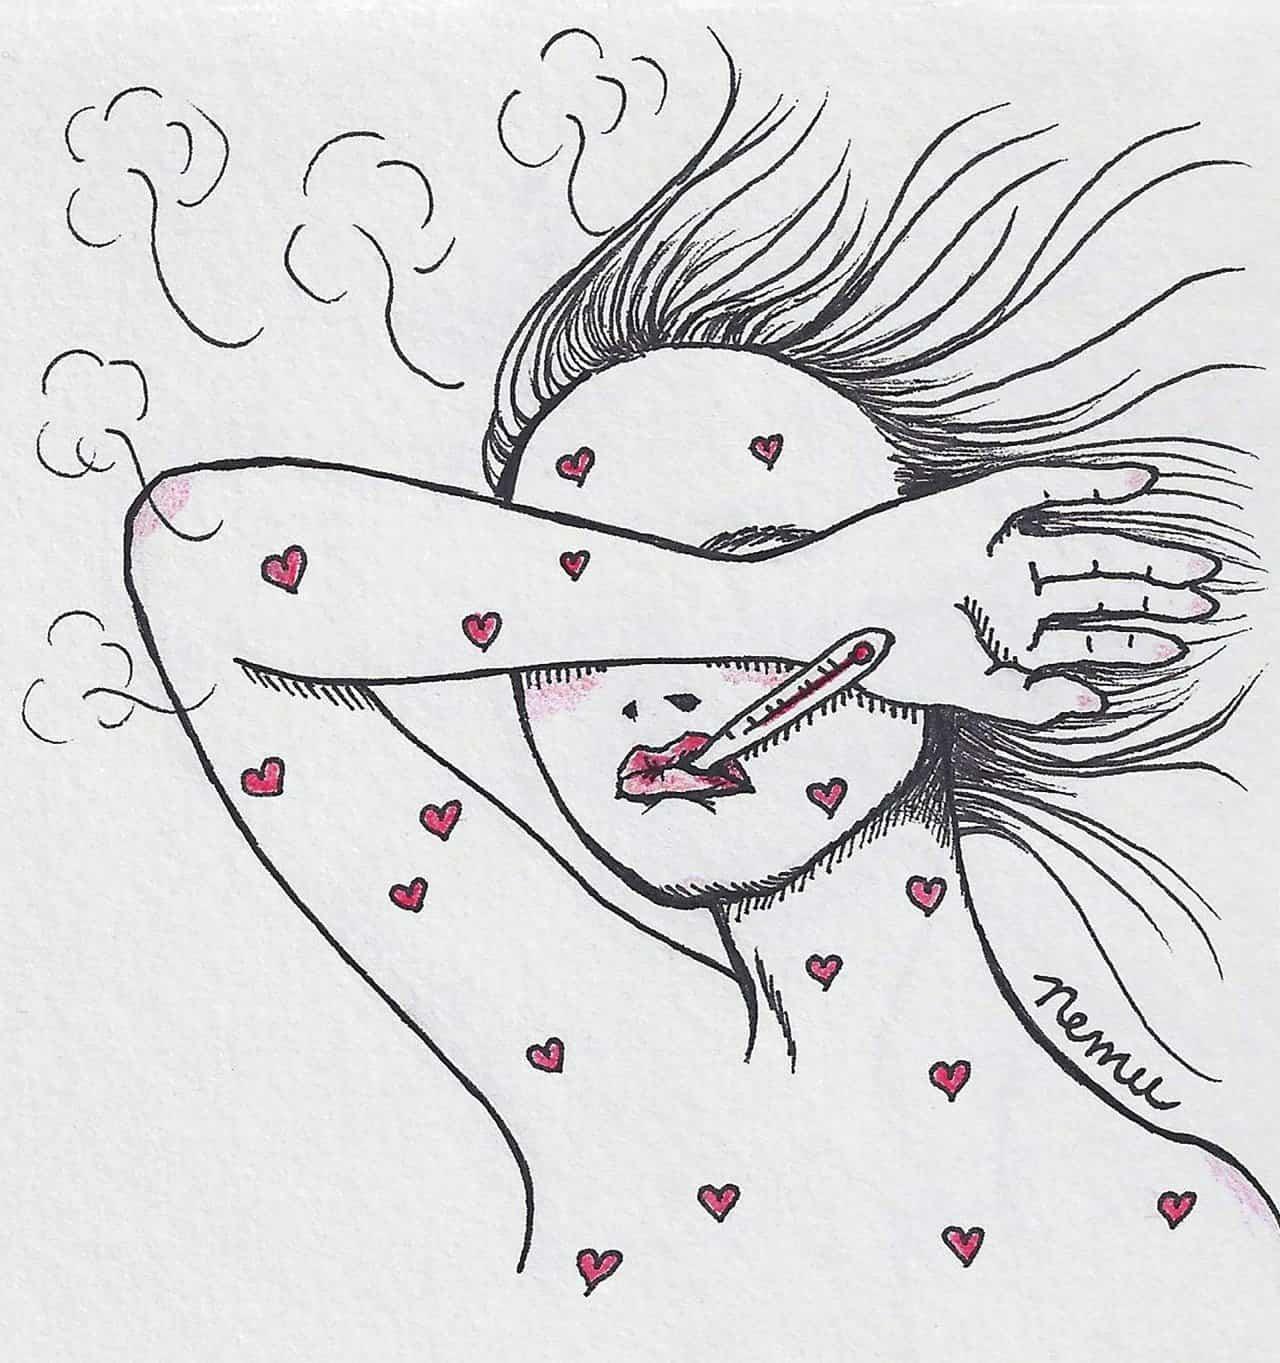 Amor enfermo